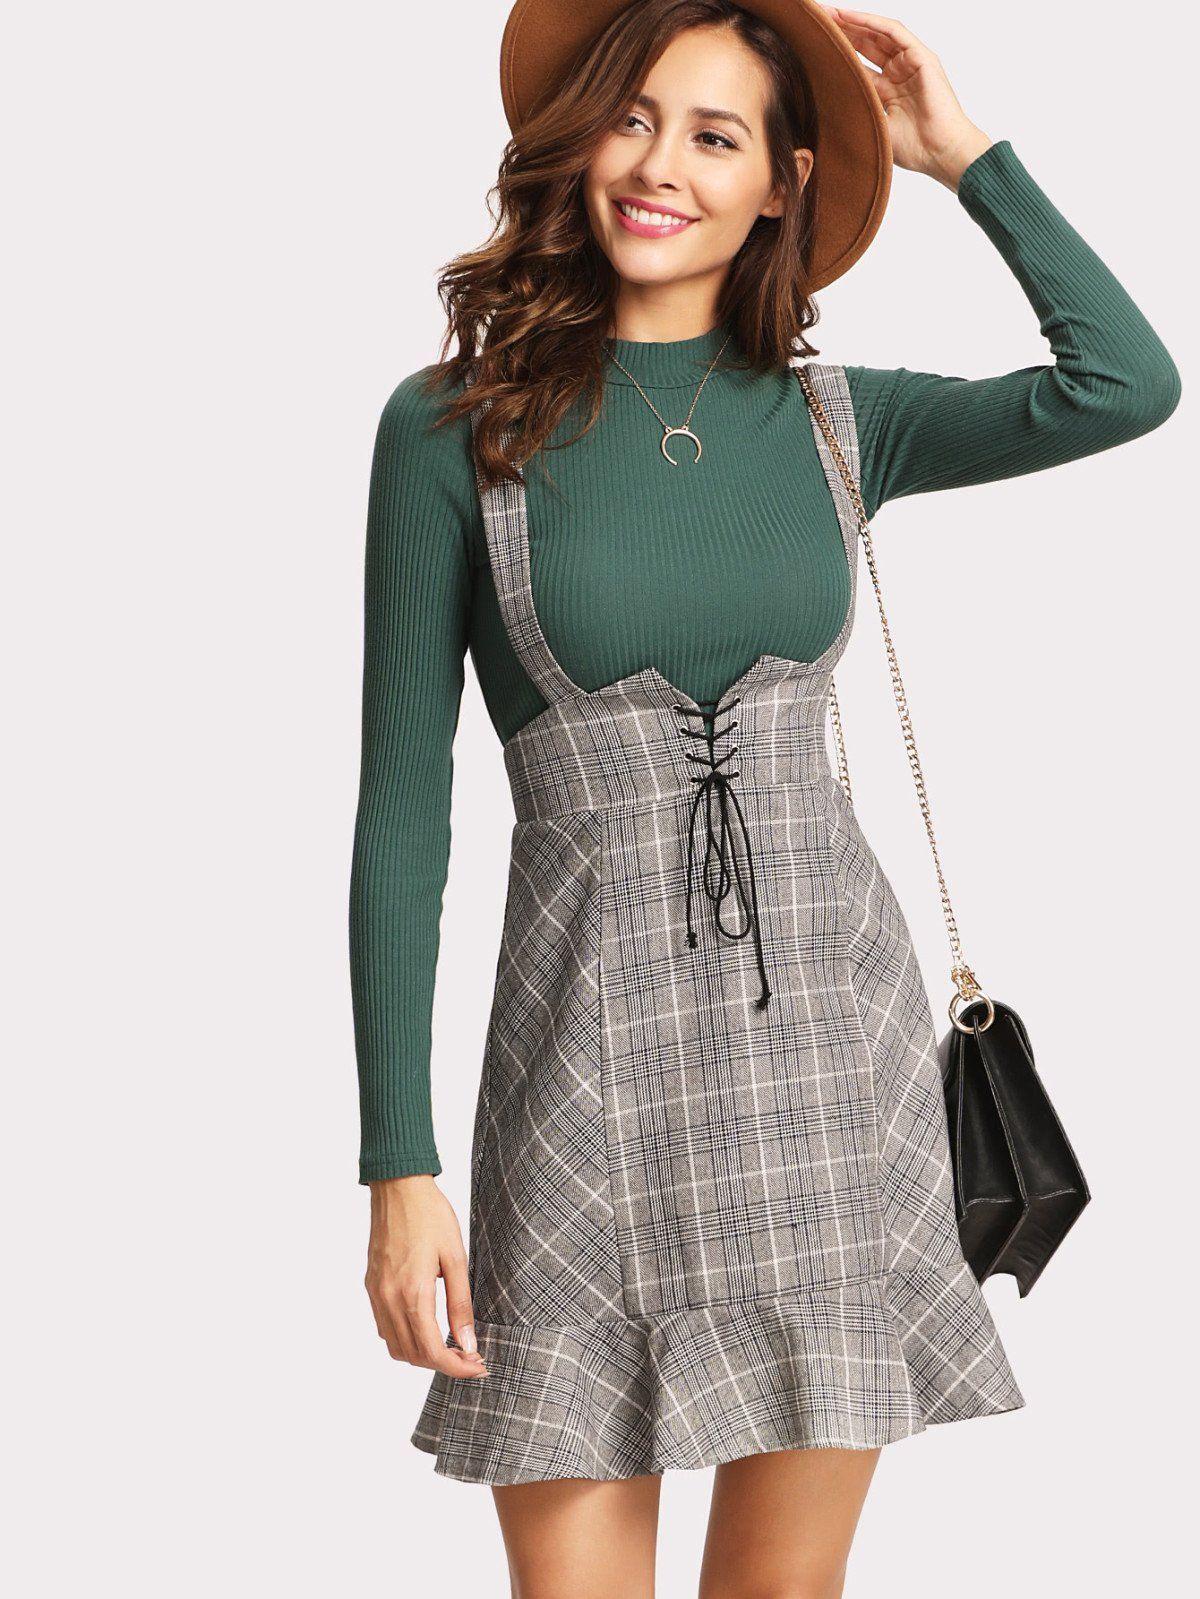 Green lace up dress  Lace Up Front Ruffle Hem Plaid Skirt  Plaid design Plaid and Ruffles